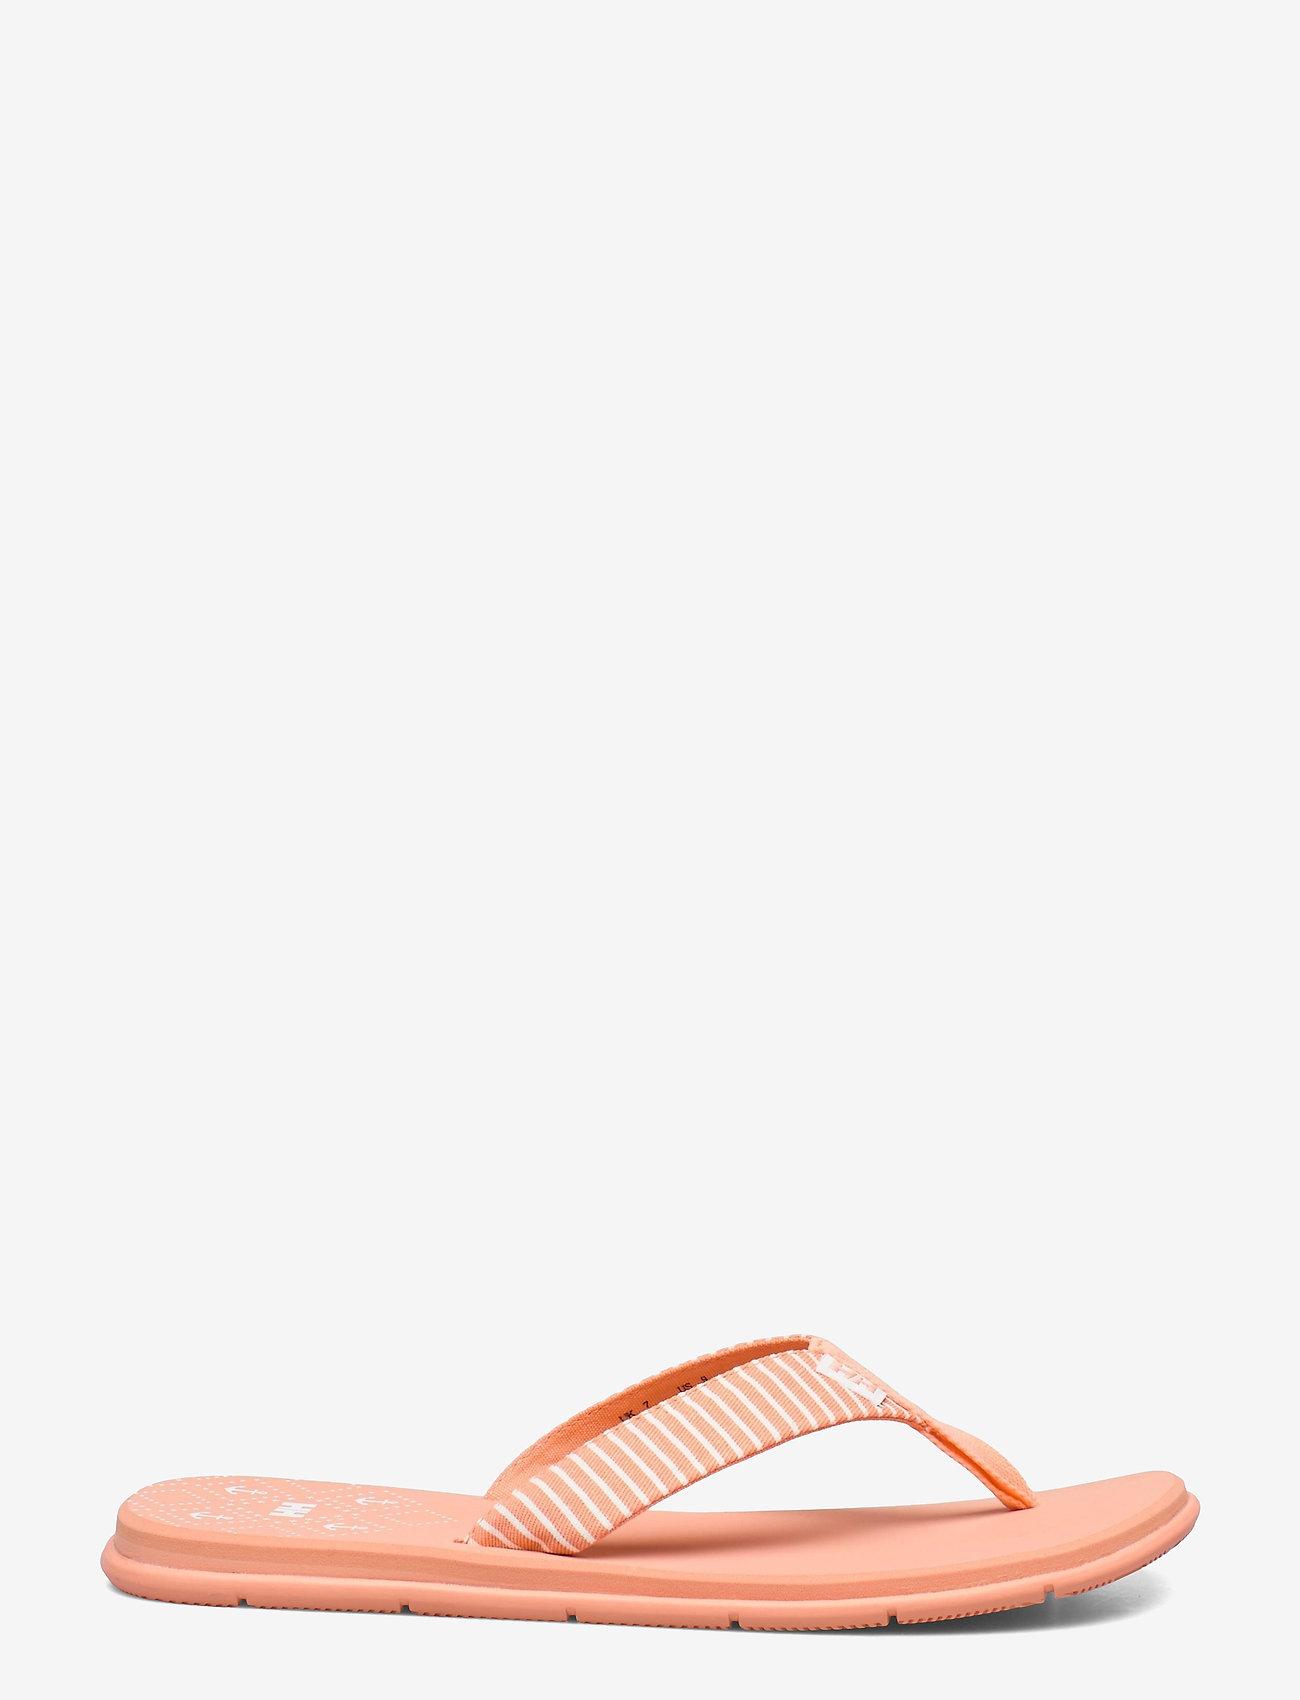 Helly Hansen - W IRIS SANDAL - sport schoenen - melon / off white - 1